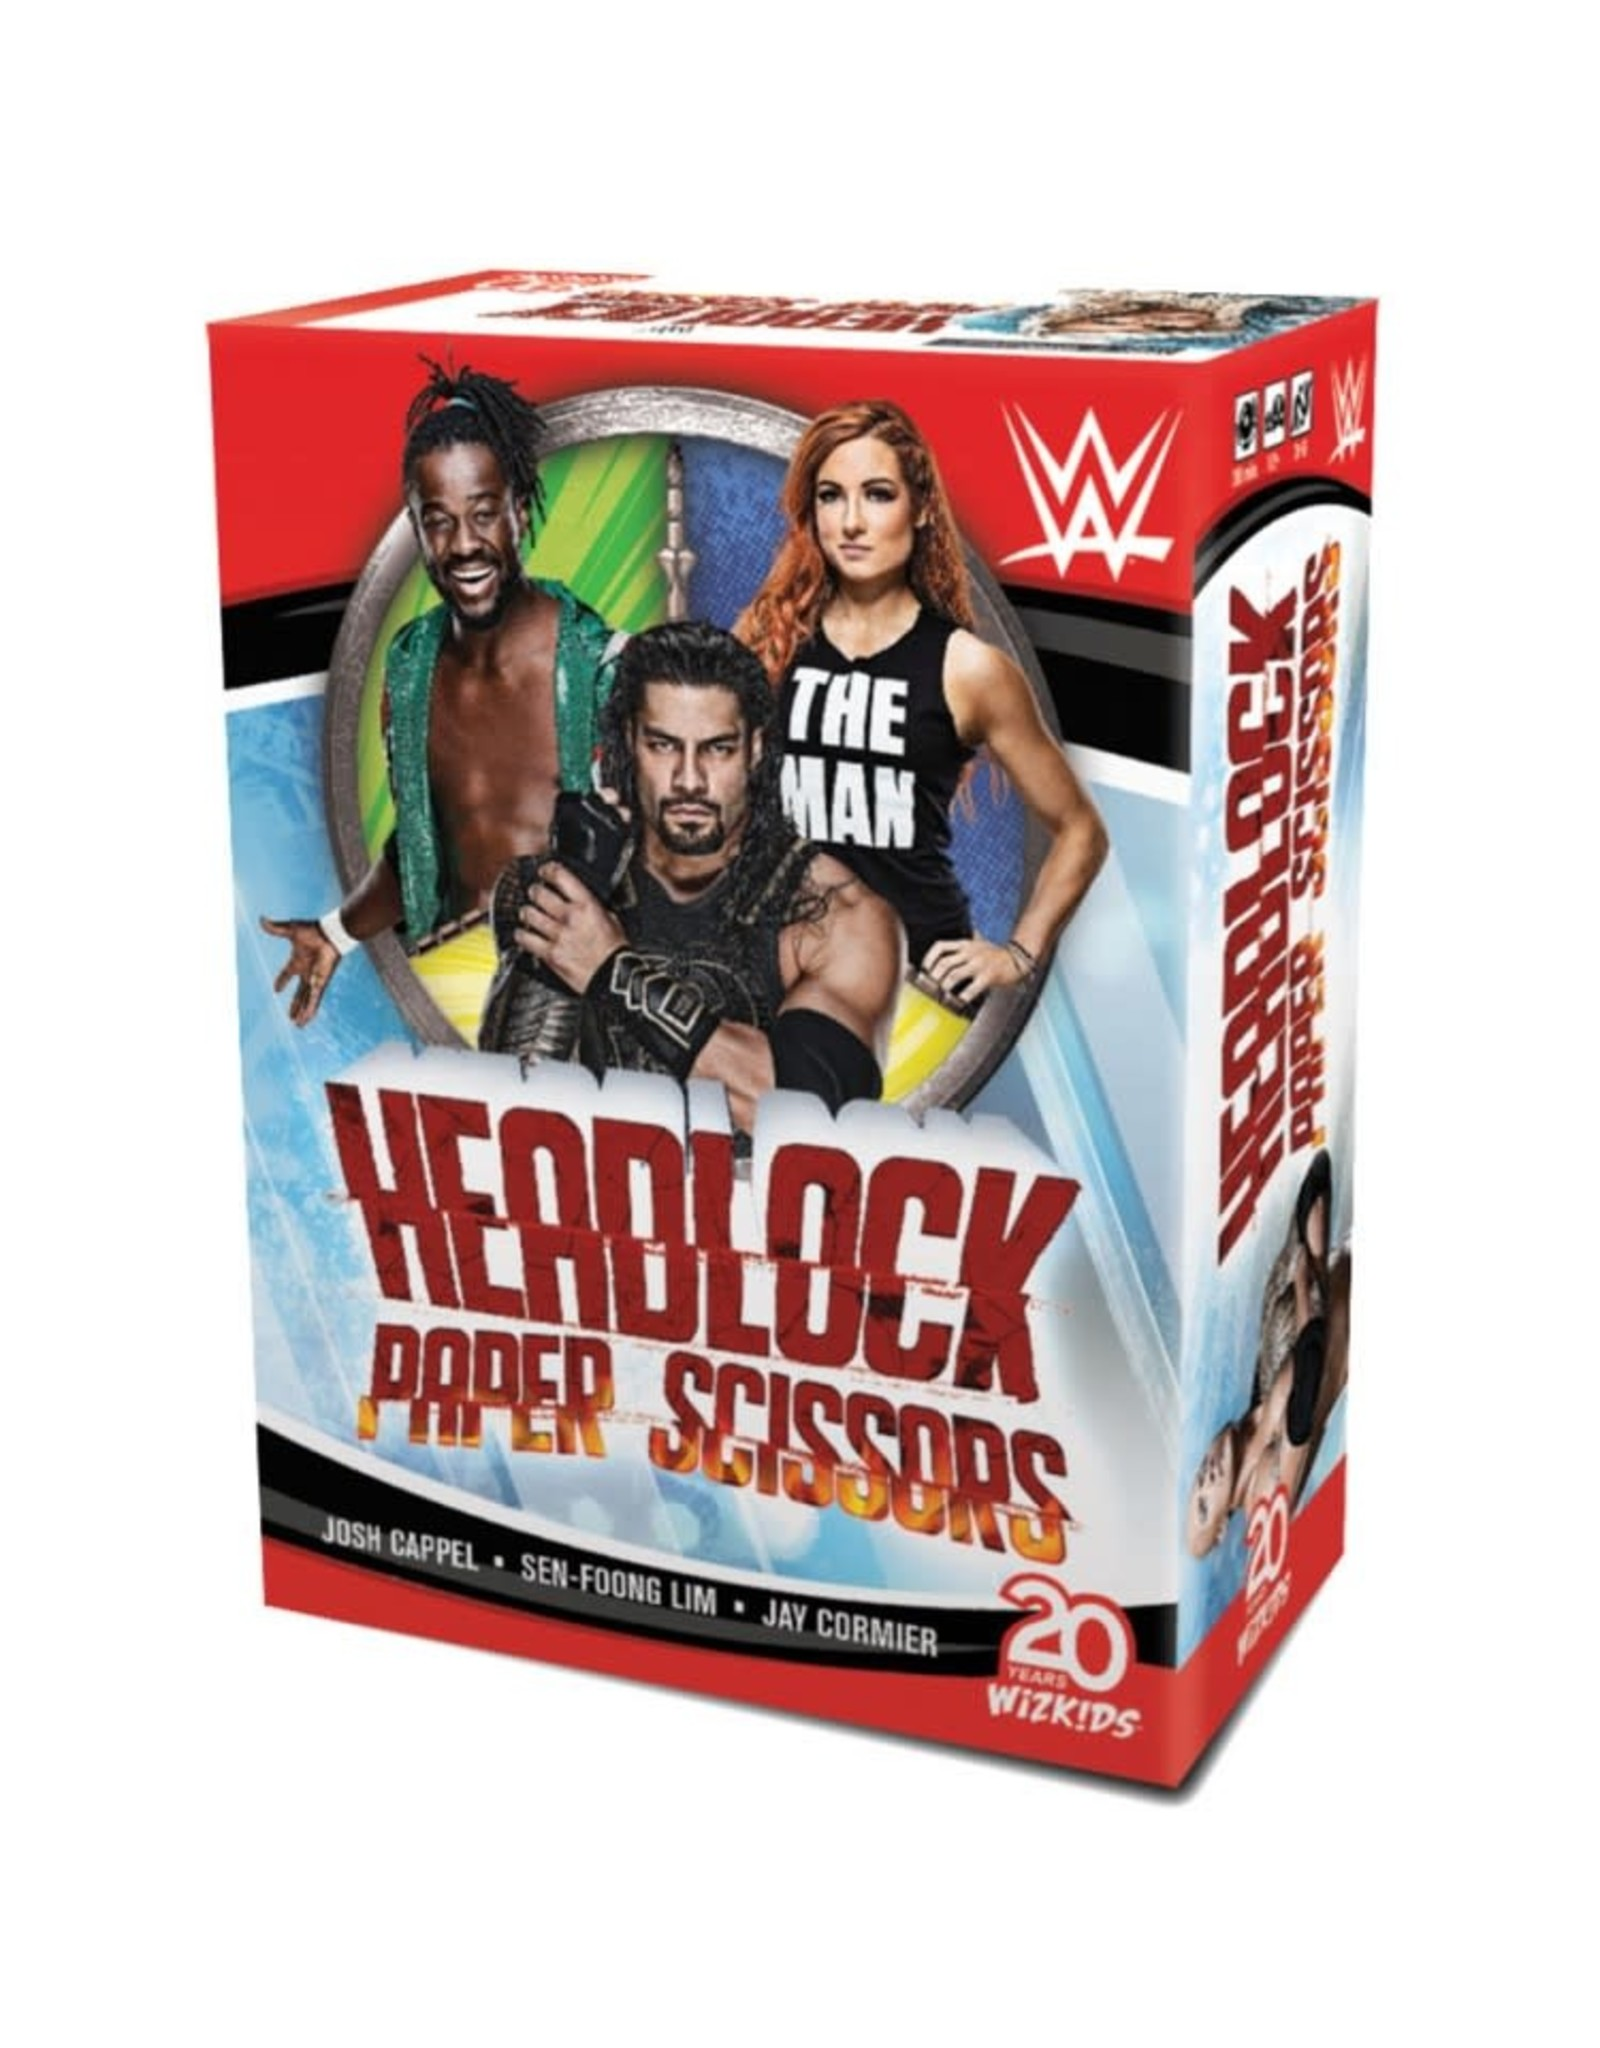 WizKids WWE: Headlock, Paper, Scissors